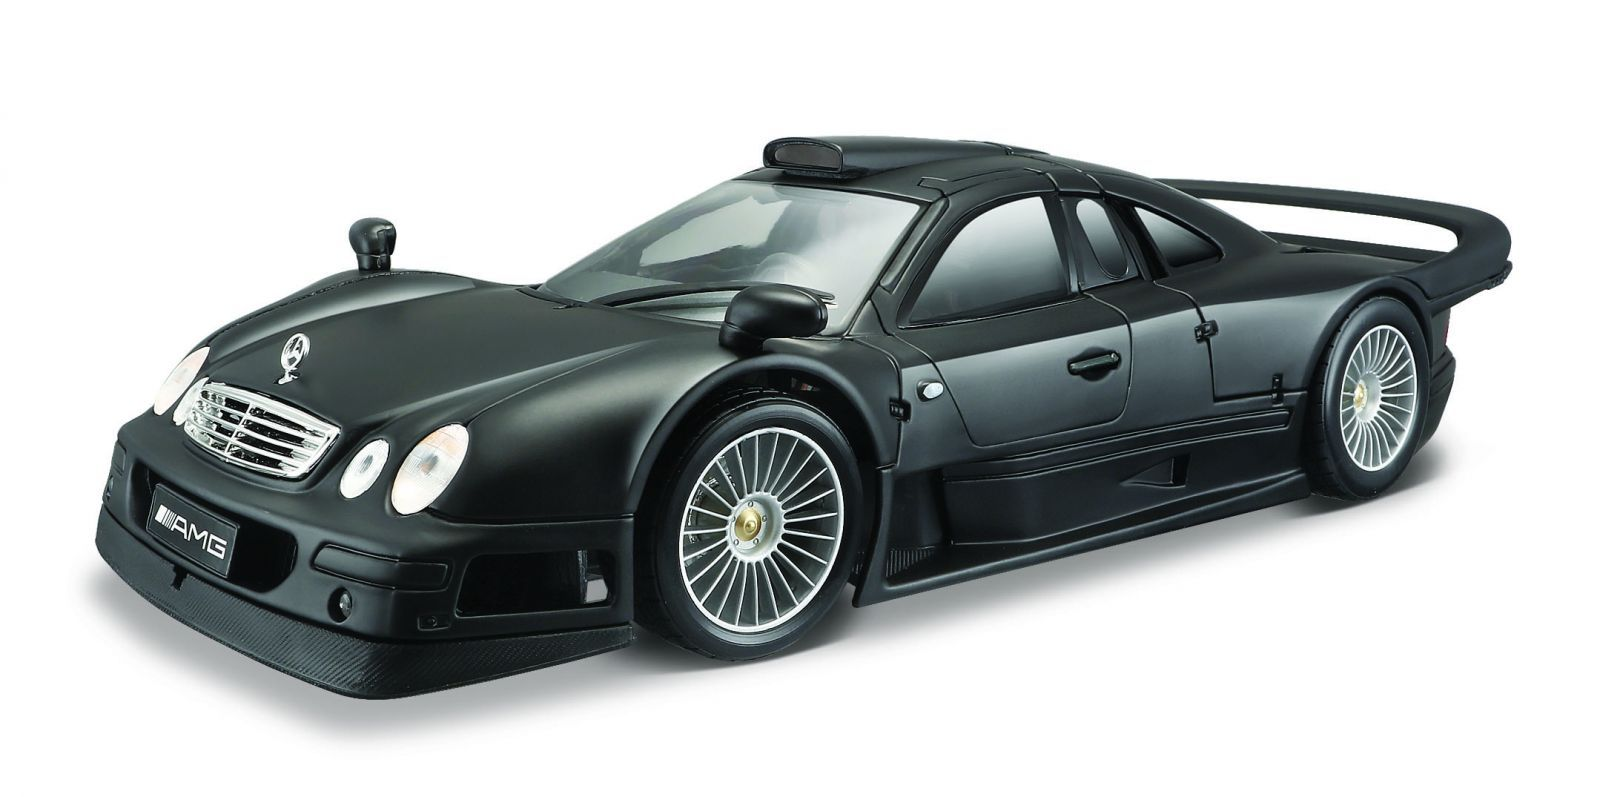 Maisto 1:18 Mercedes Benz CLK GTR - černá barva